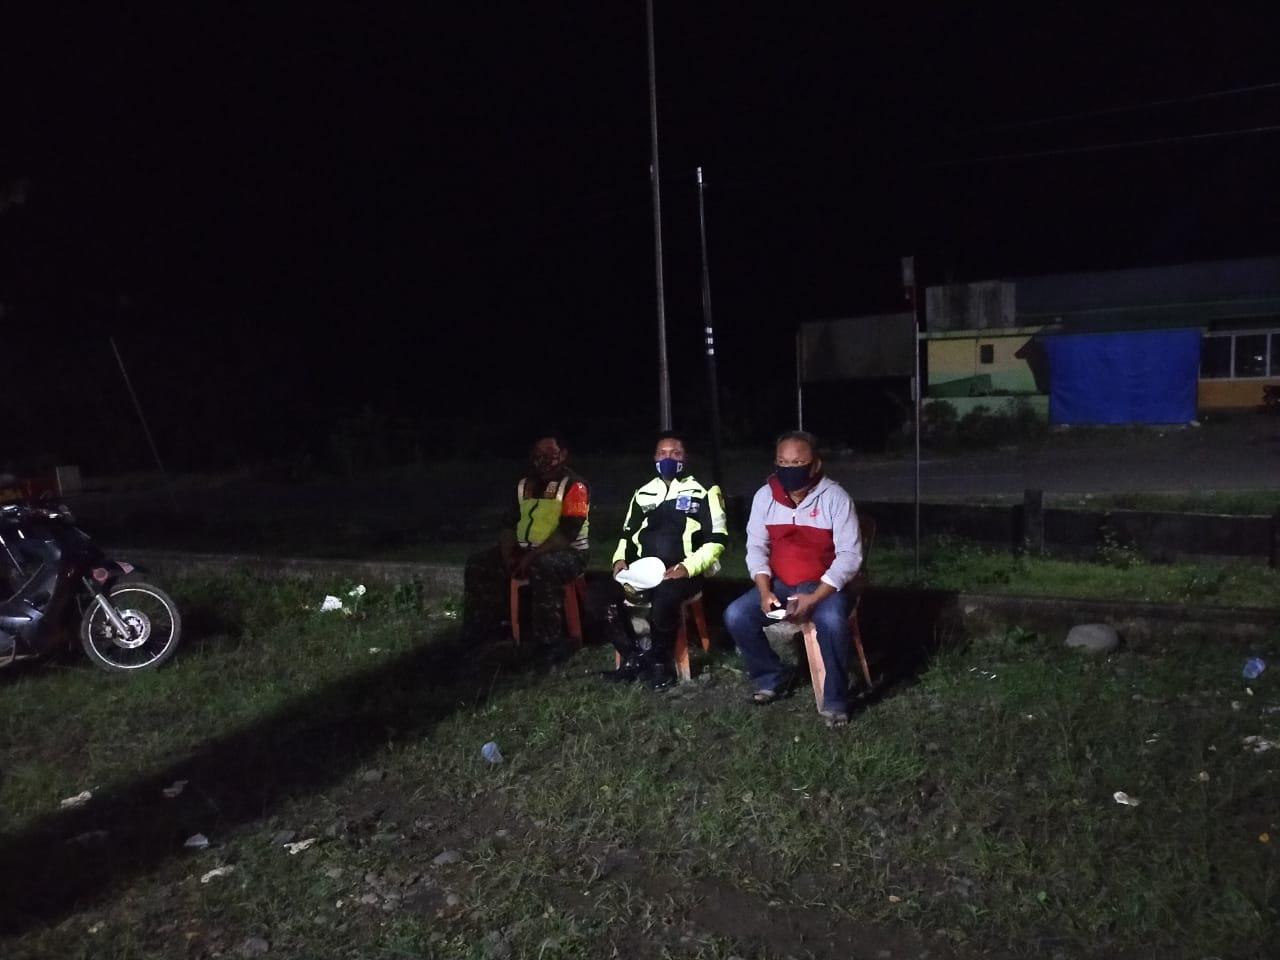 Wakapolres Soppeng Kunjungi Posko Pam Ketupat Marioriwawo